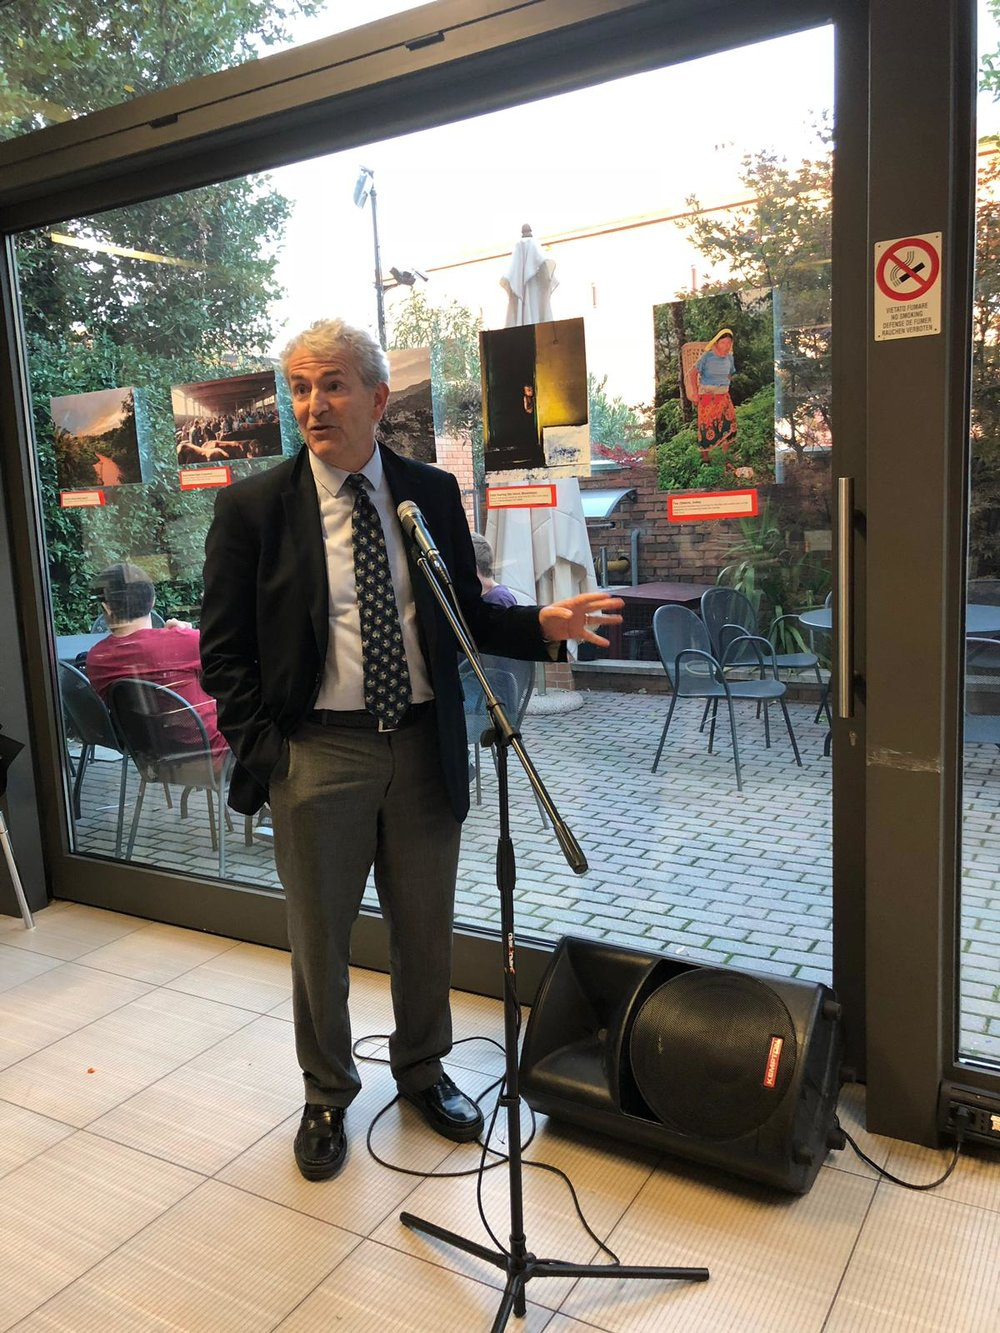 SAIS Europe Director Dr. Michael Plummer spoke at the Bologna event